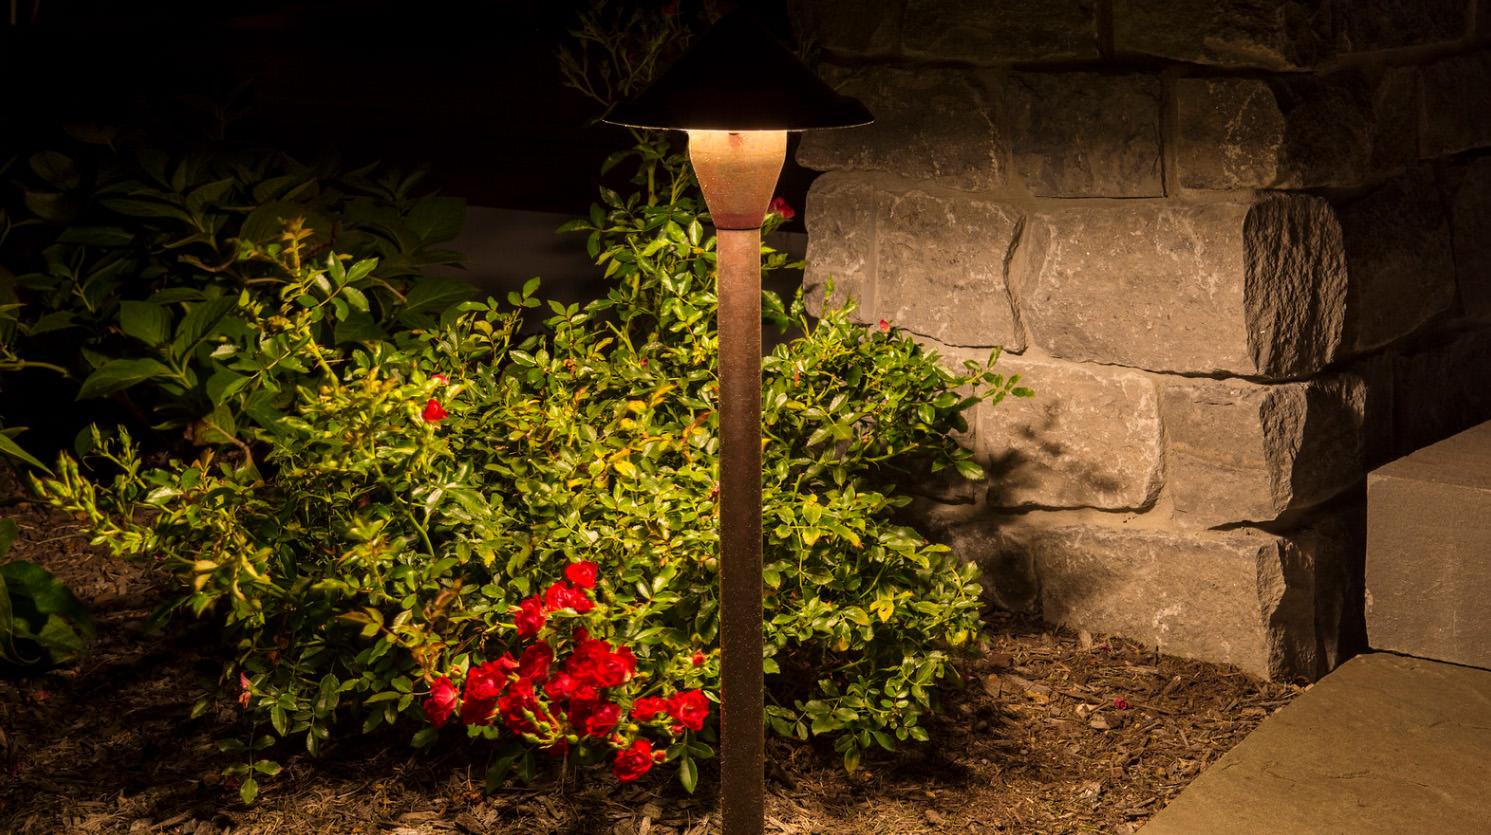 Landscape Lighting Fixture Outdoors New Yourk Hamtons Long Island Manhattan Jpg